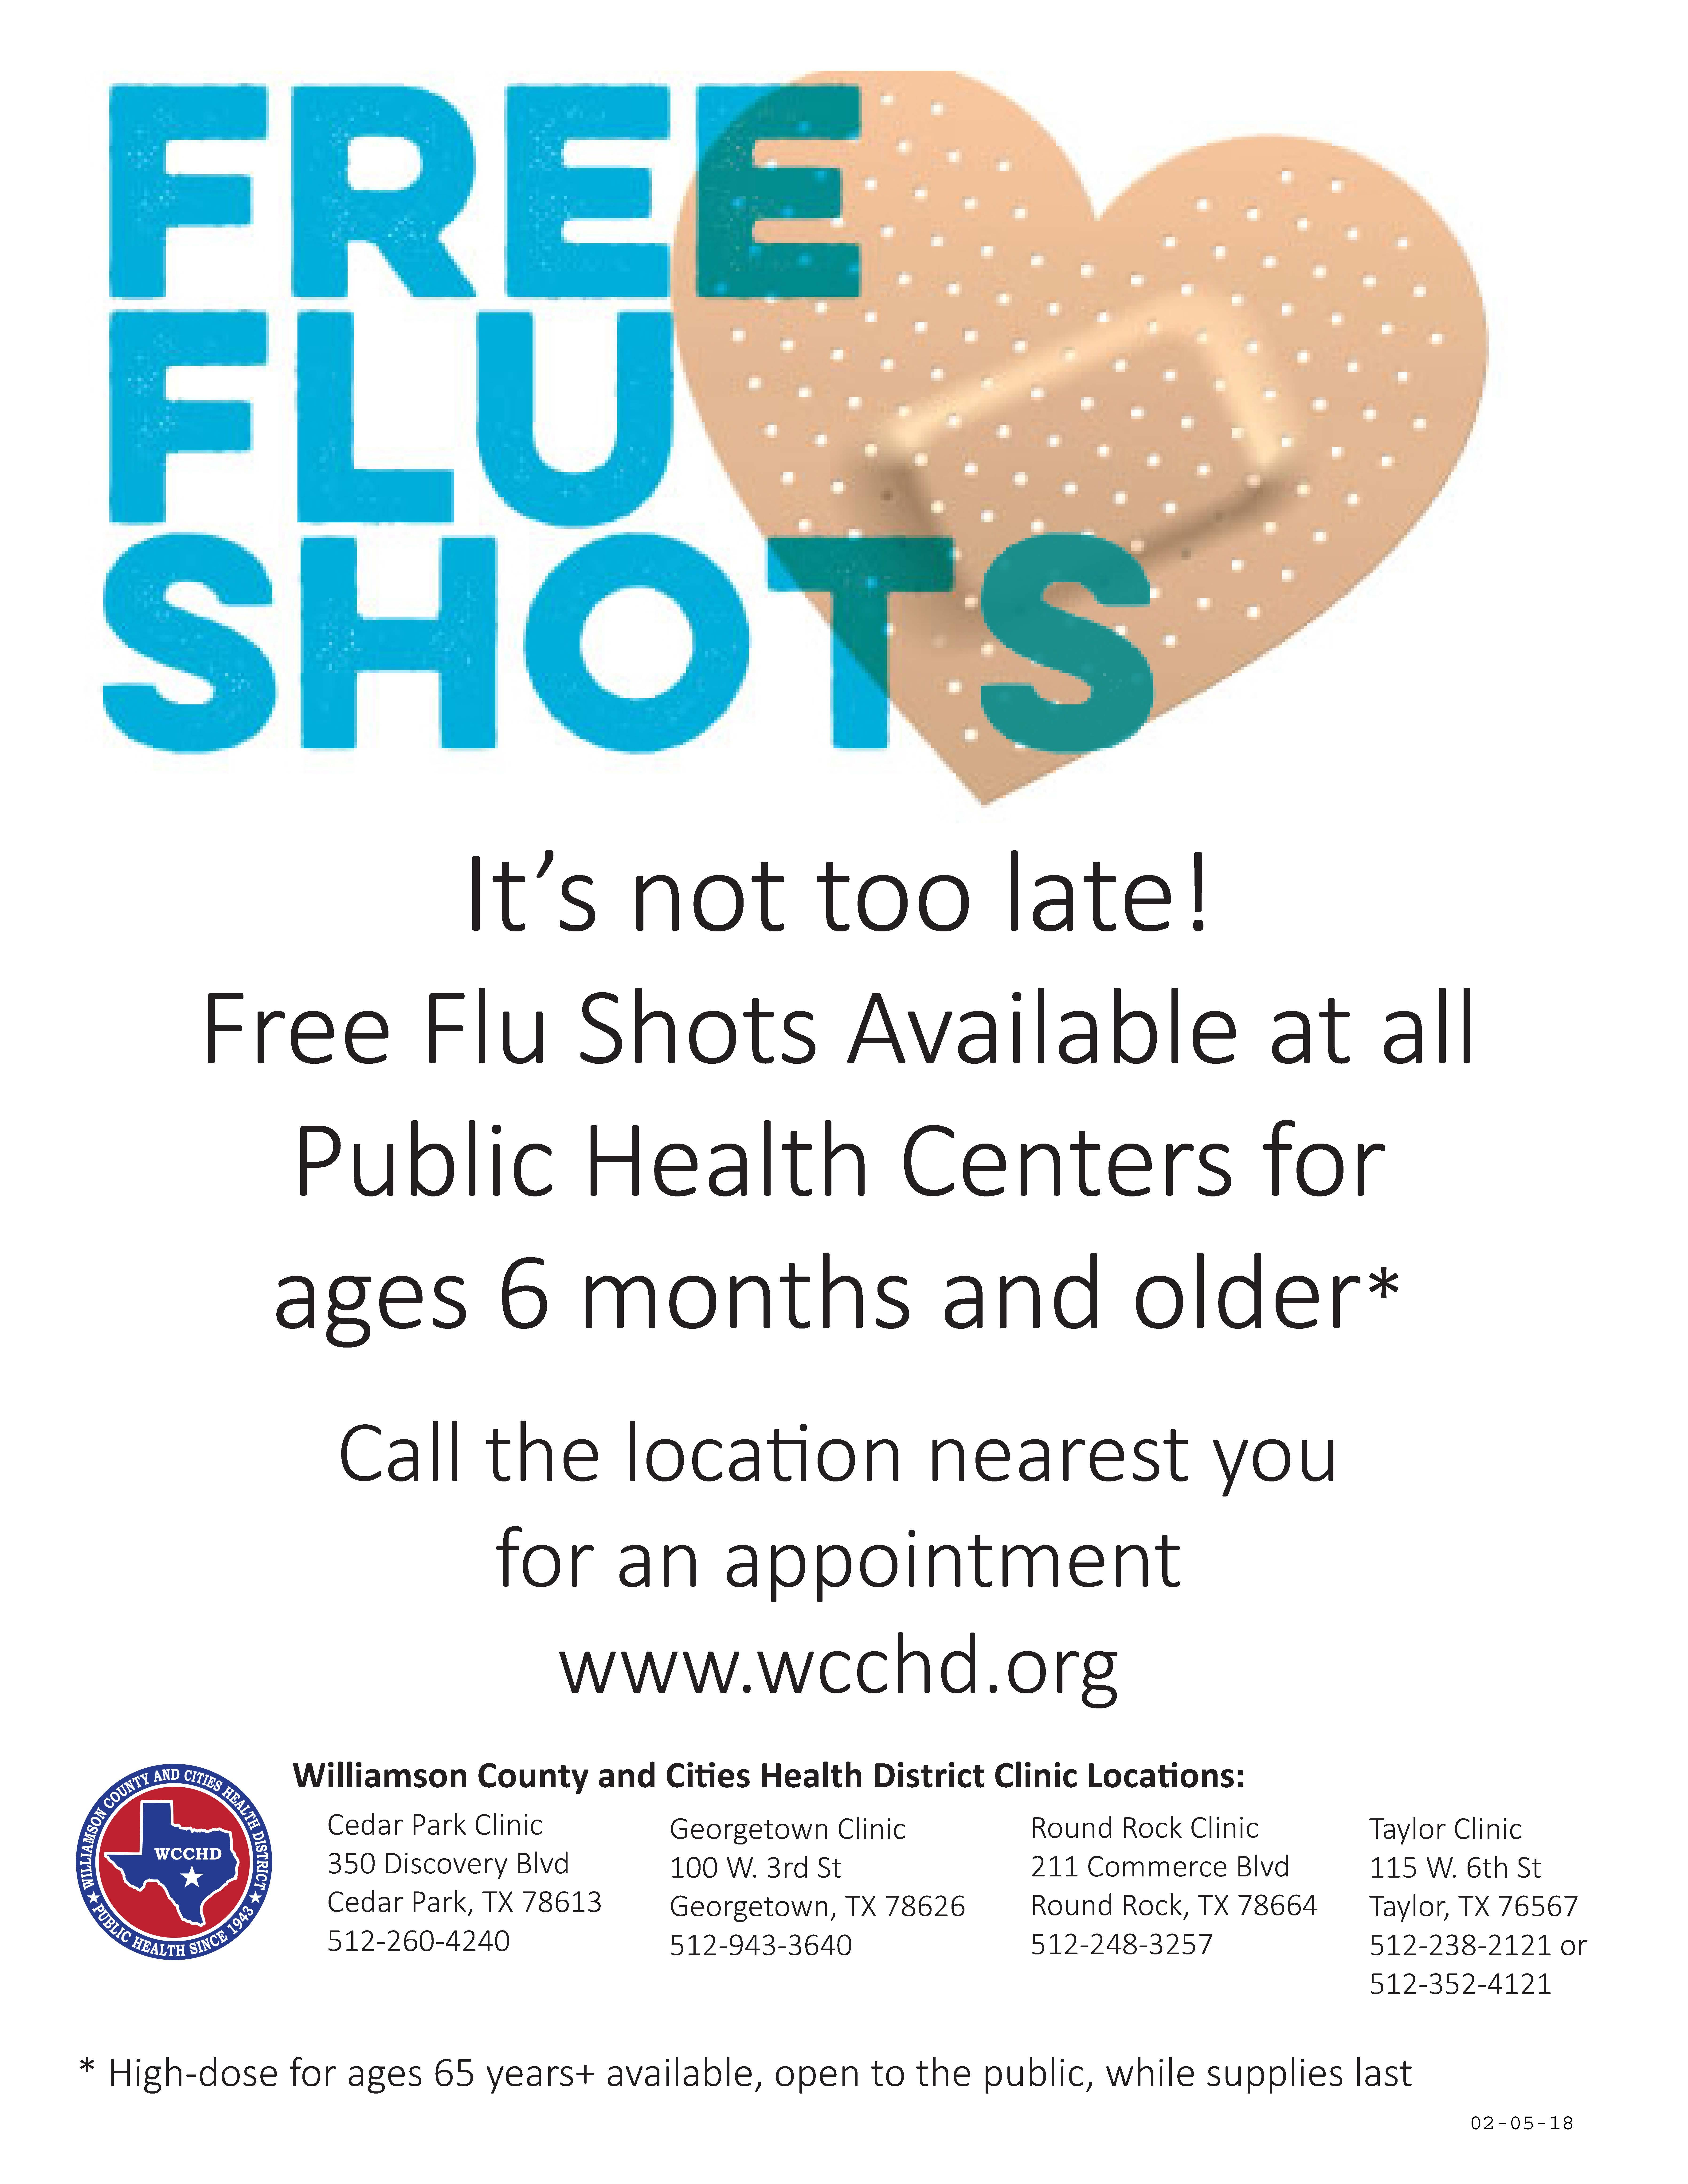 flu jab - photo #24